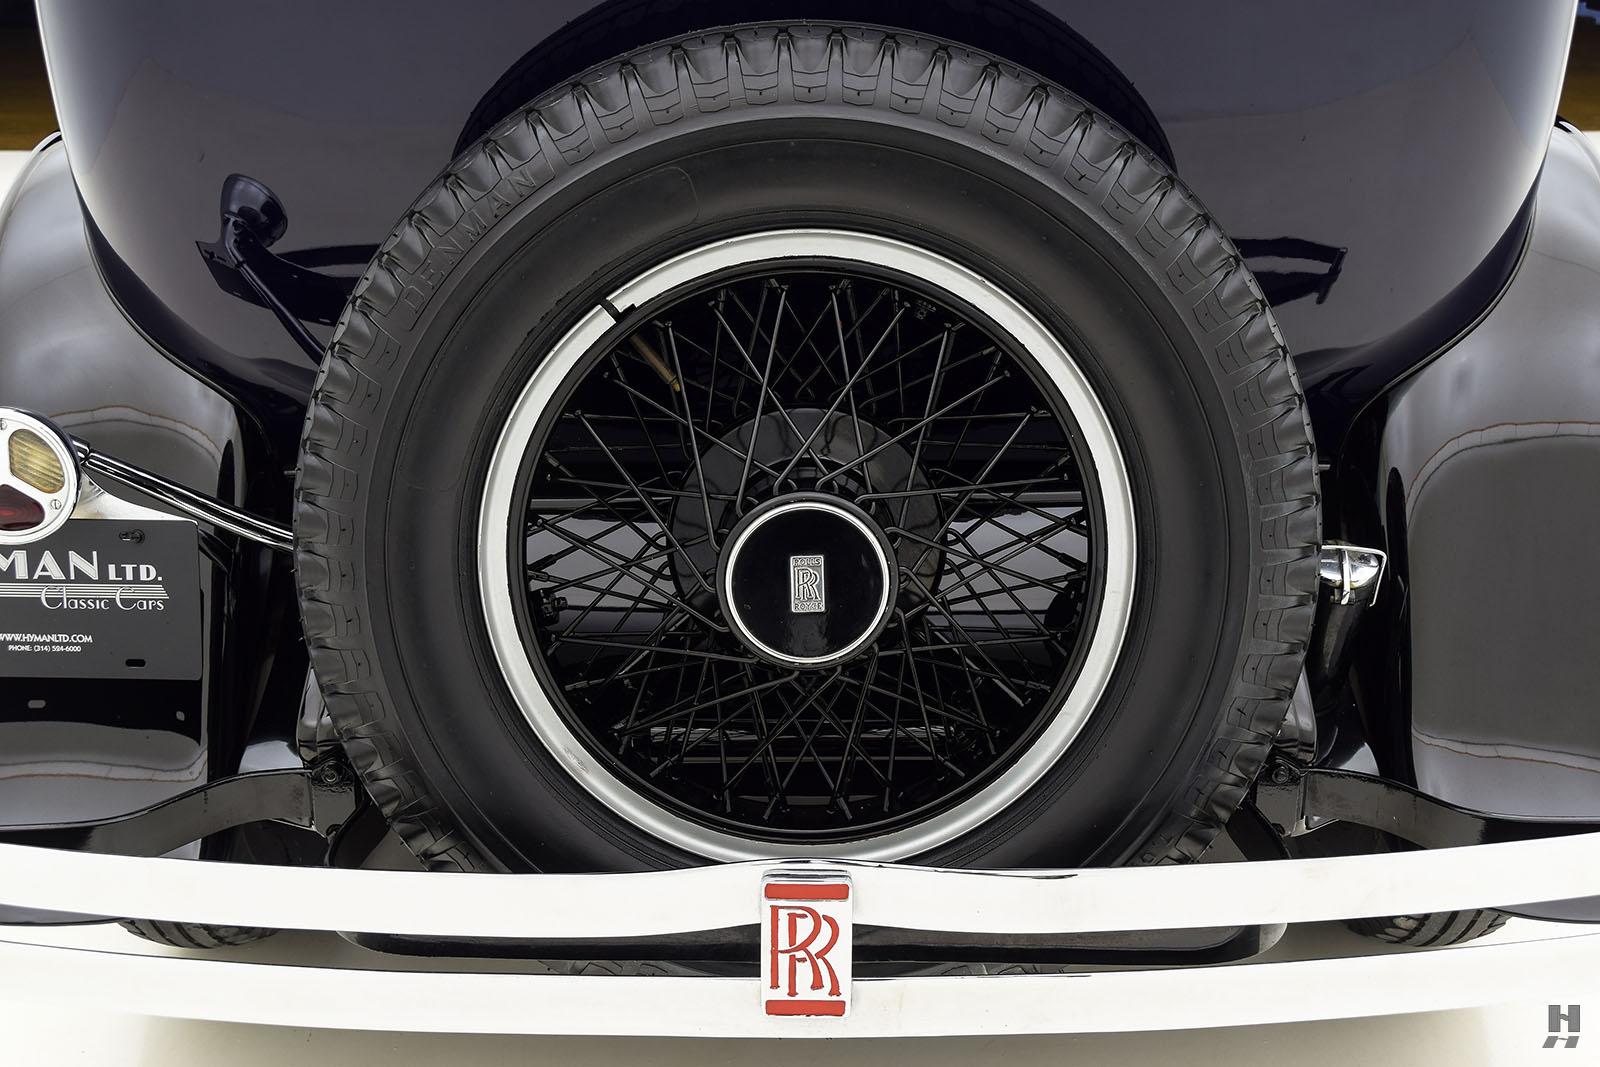 1931 Rolls-Royce Phantom I Newport Town Car For Sale | Buy Cars ...